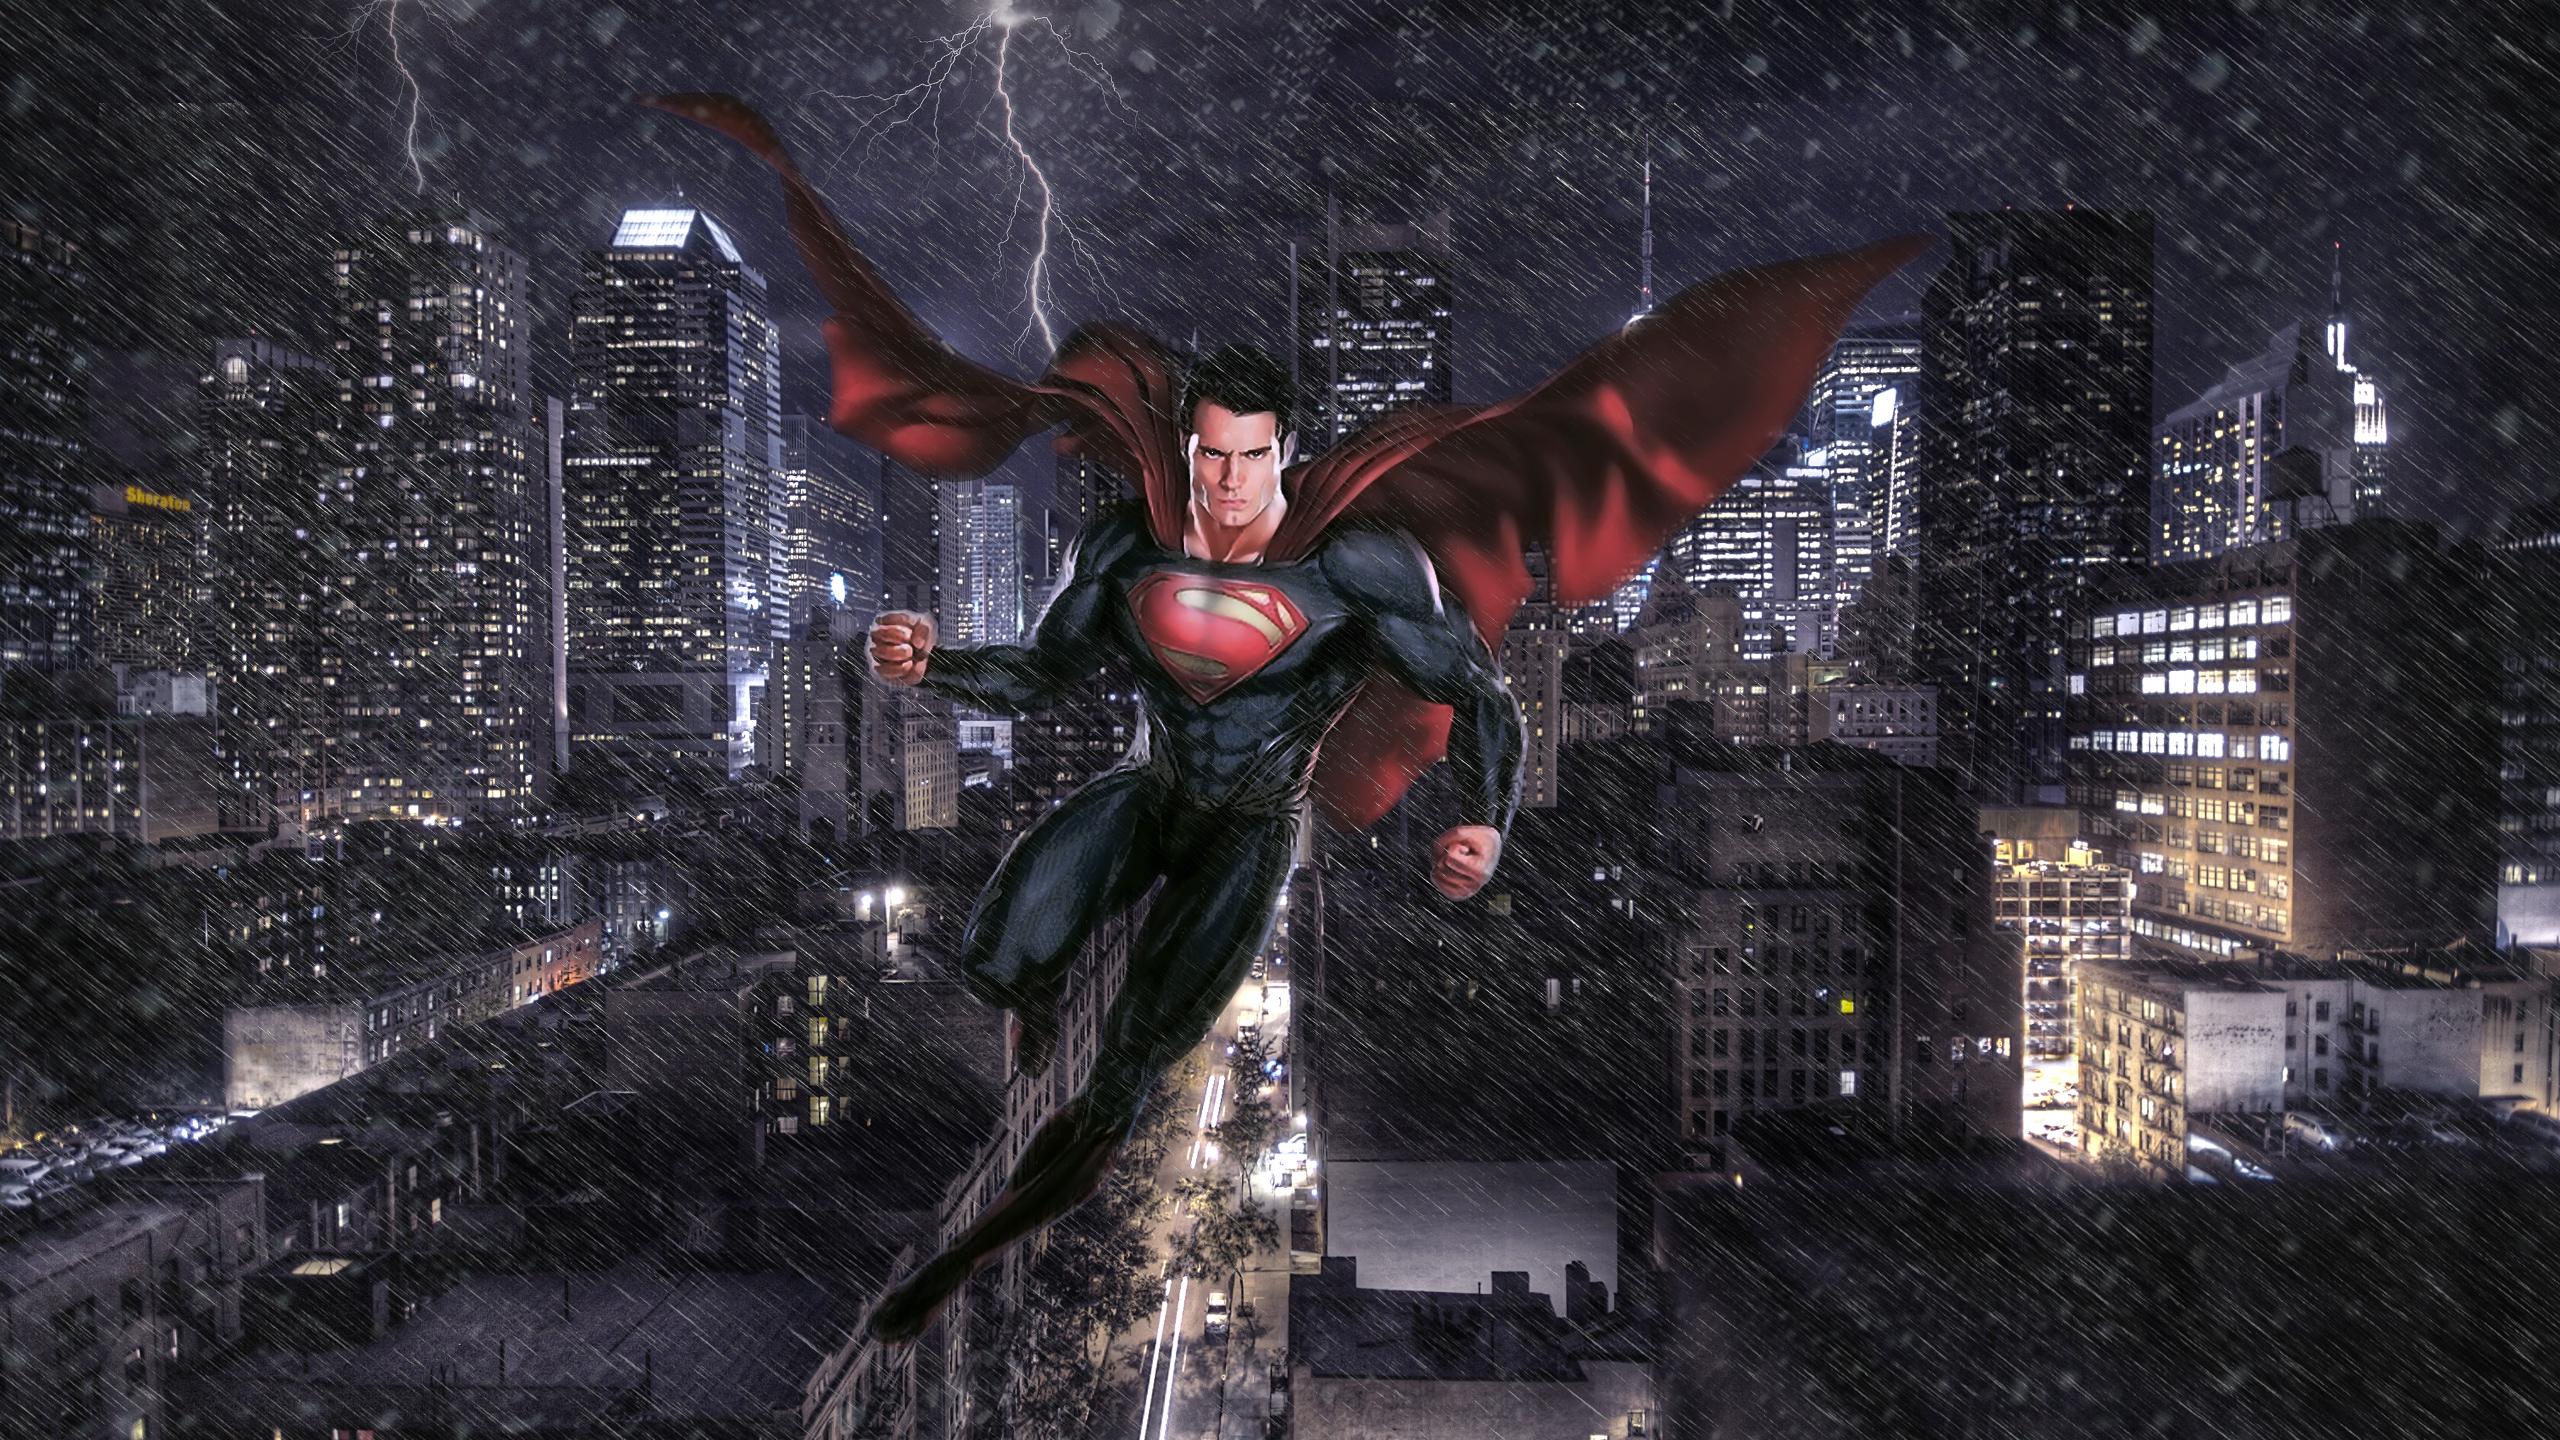 Man Of Steel Art Hd Superheroes 4k Wallpapers Images Backgrounds